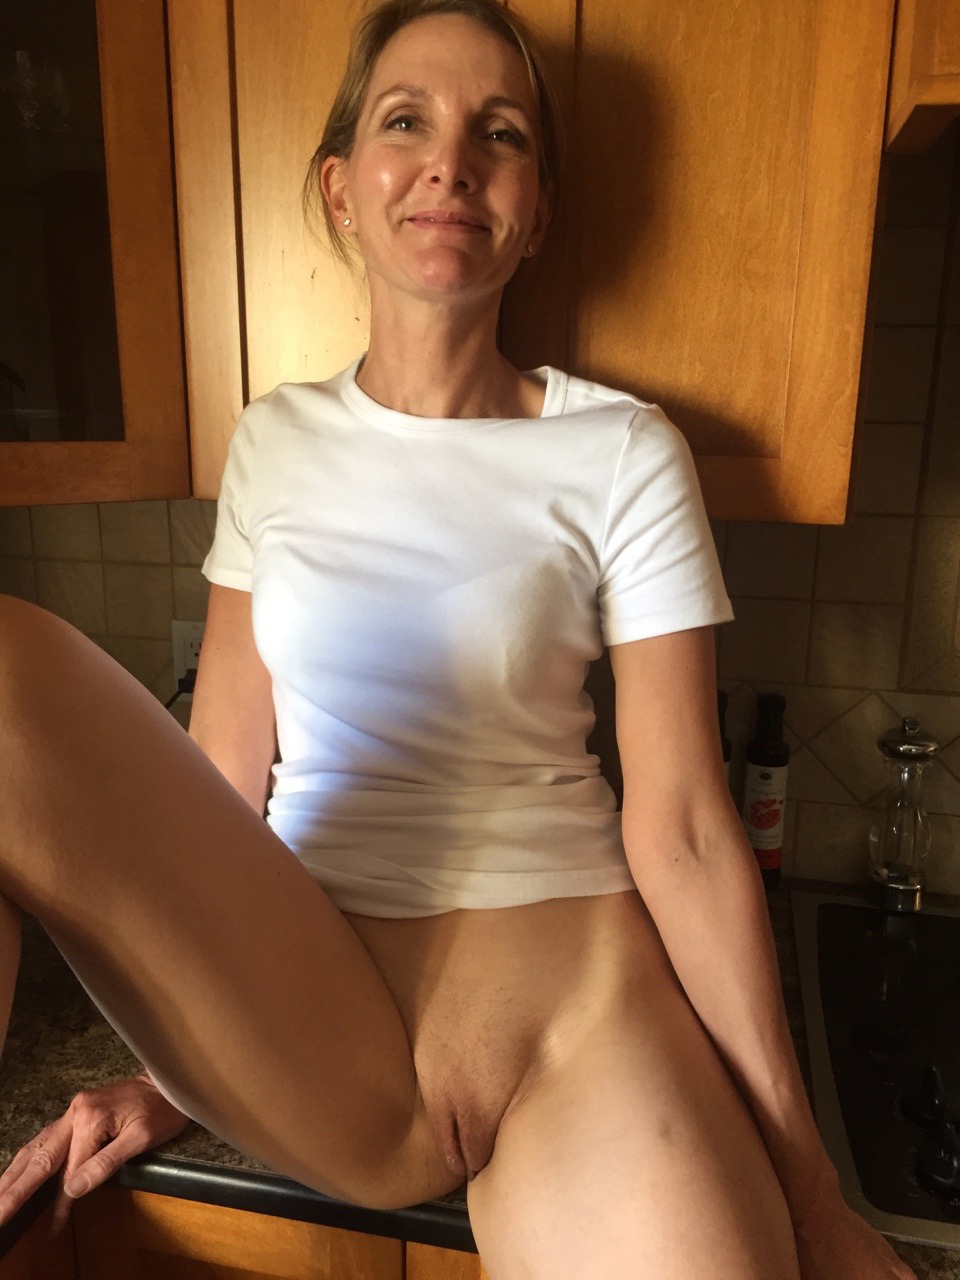 Large naked female breasts